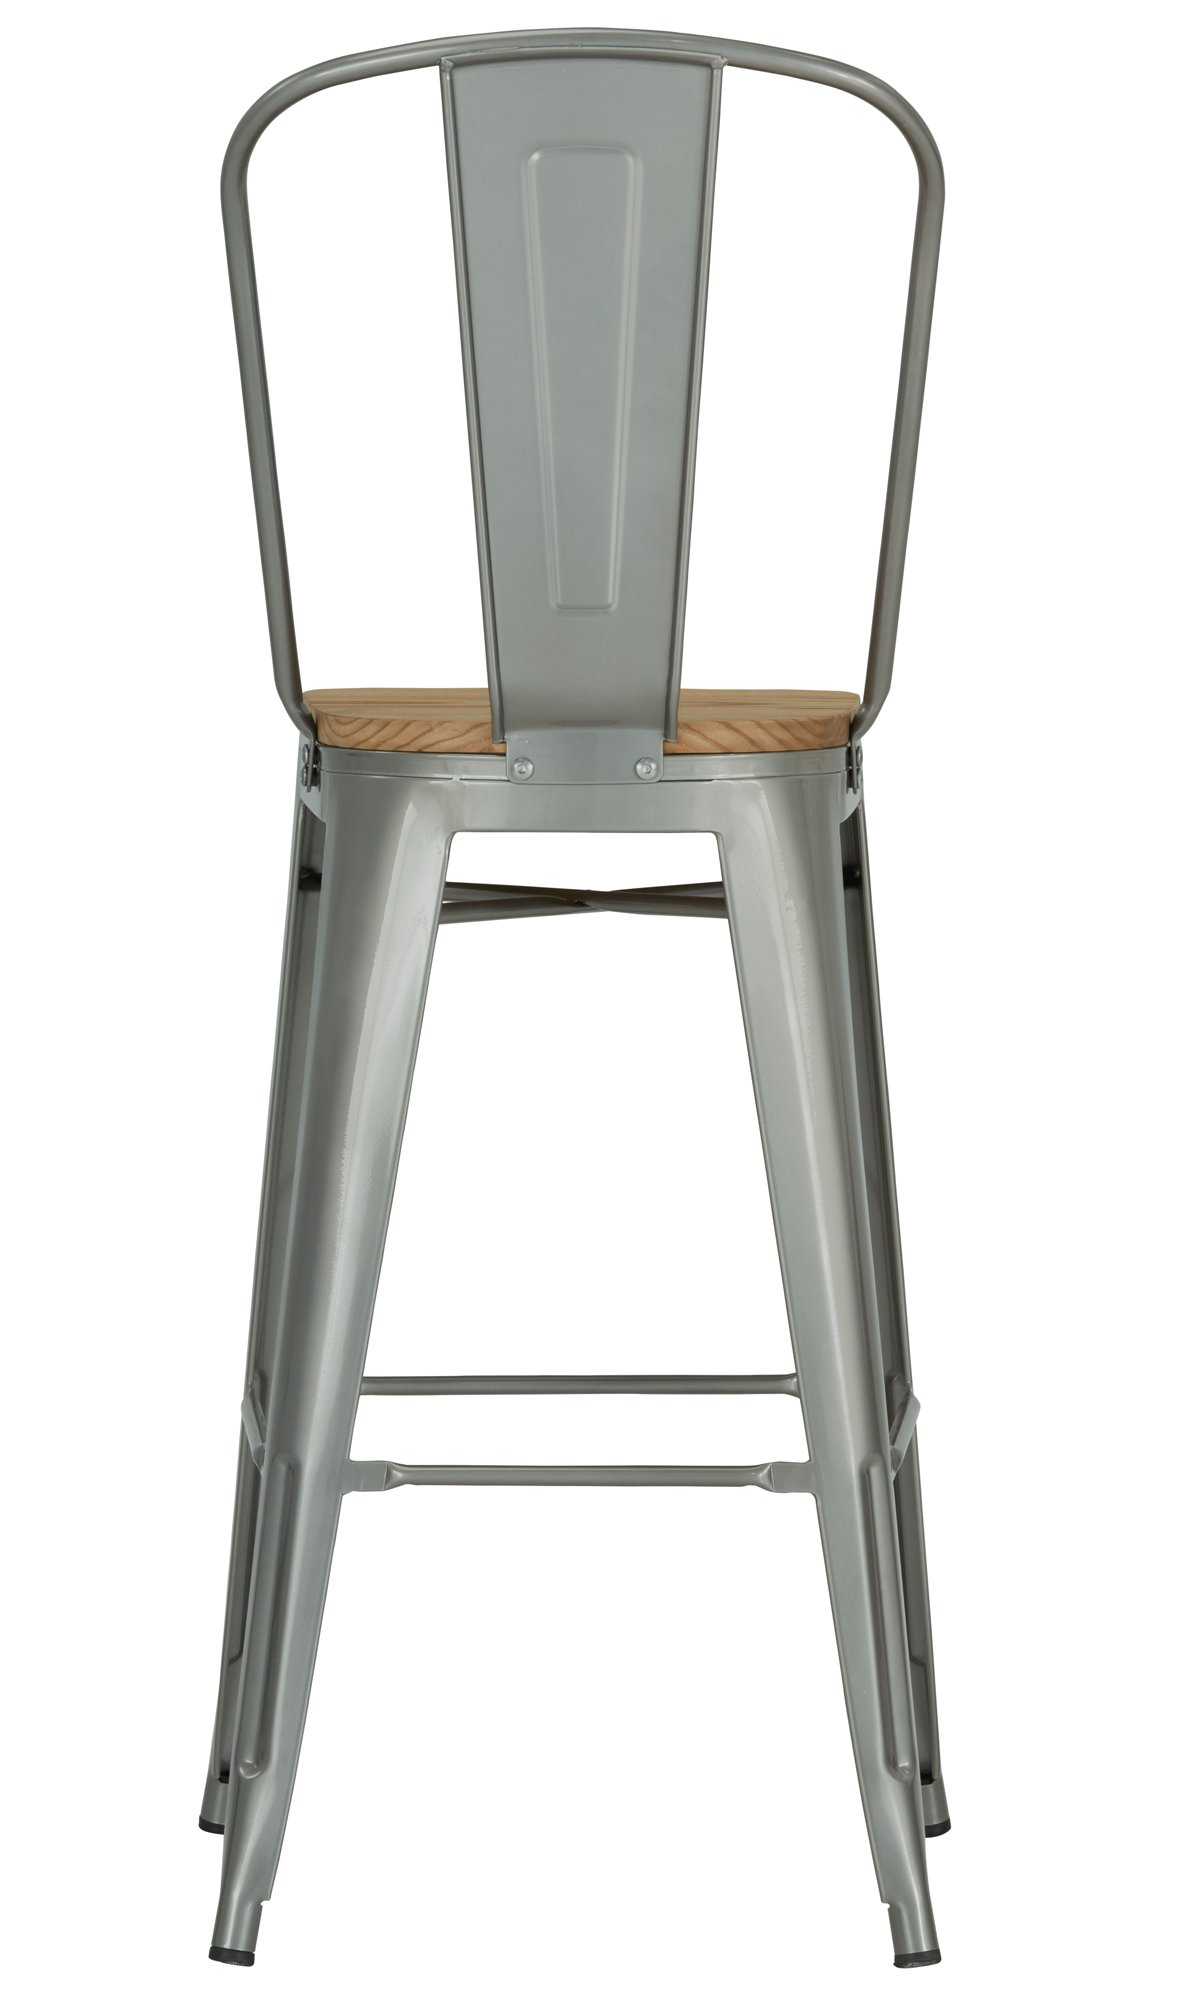 "Huntley Light Tone Wood 30"" Wood Barstool"